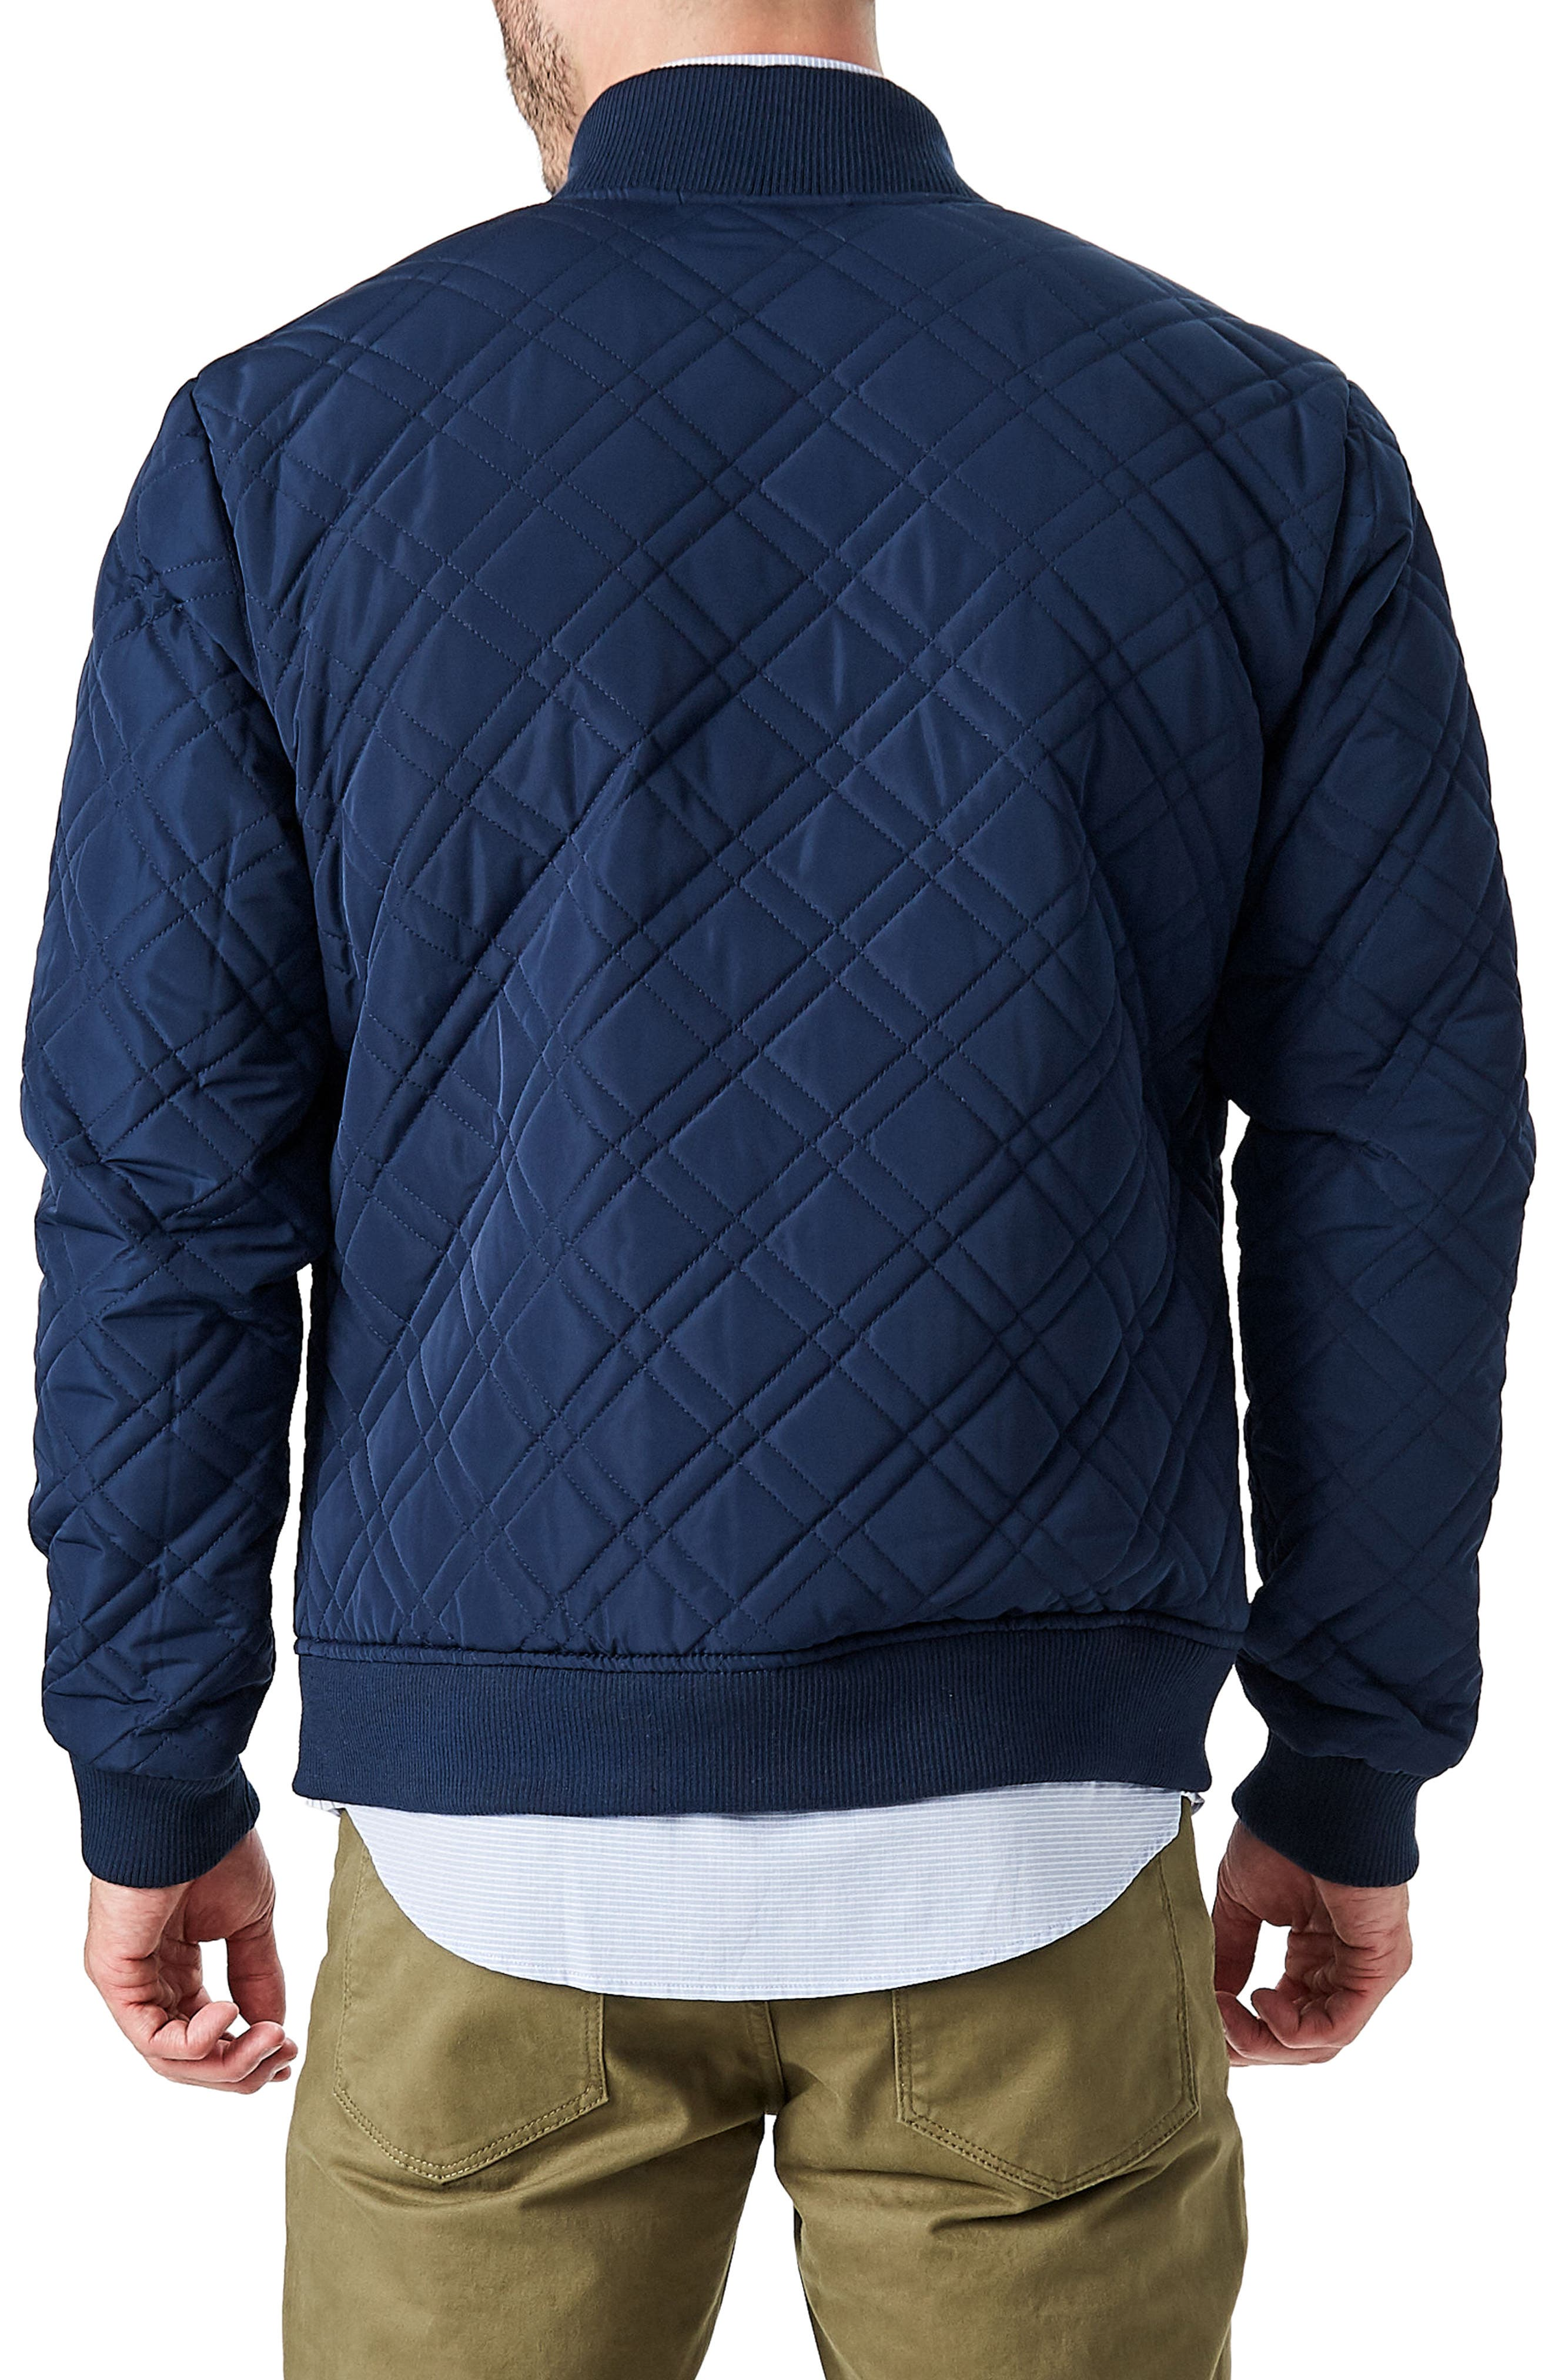 Arca Quilt Jacket,                             Alternate thumbnail 2, color,                             Navy